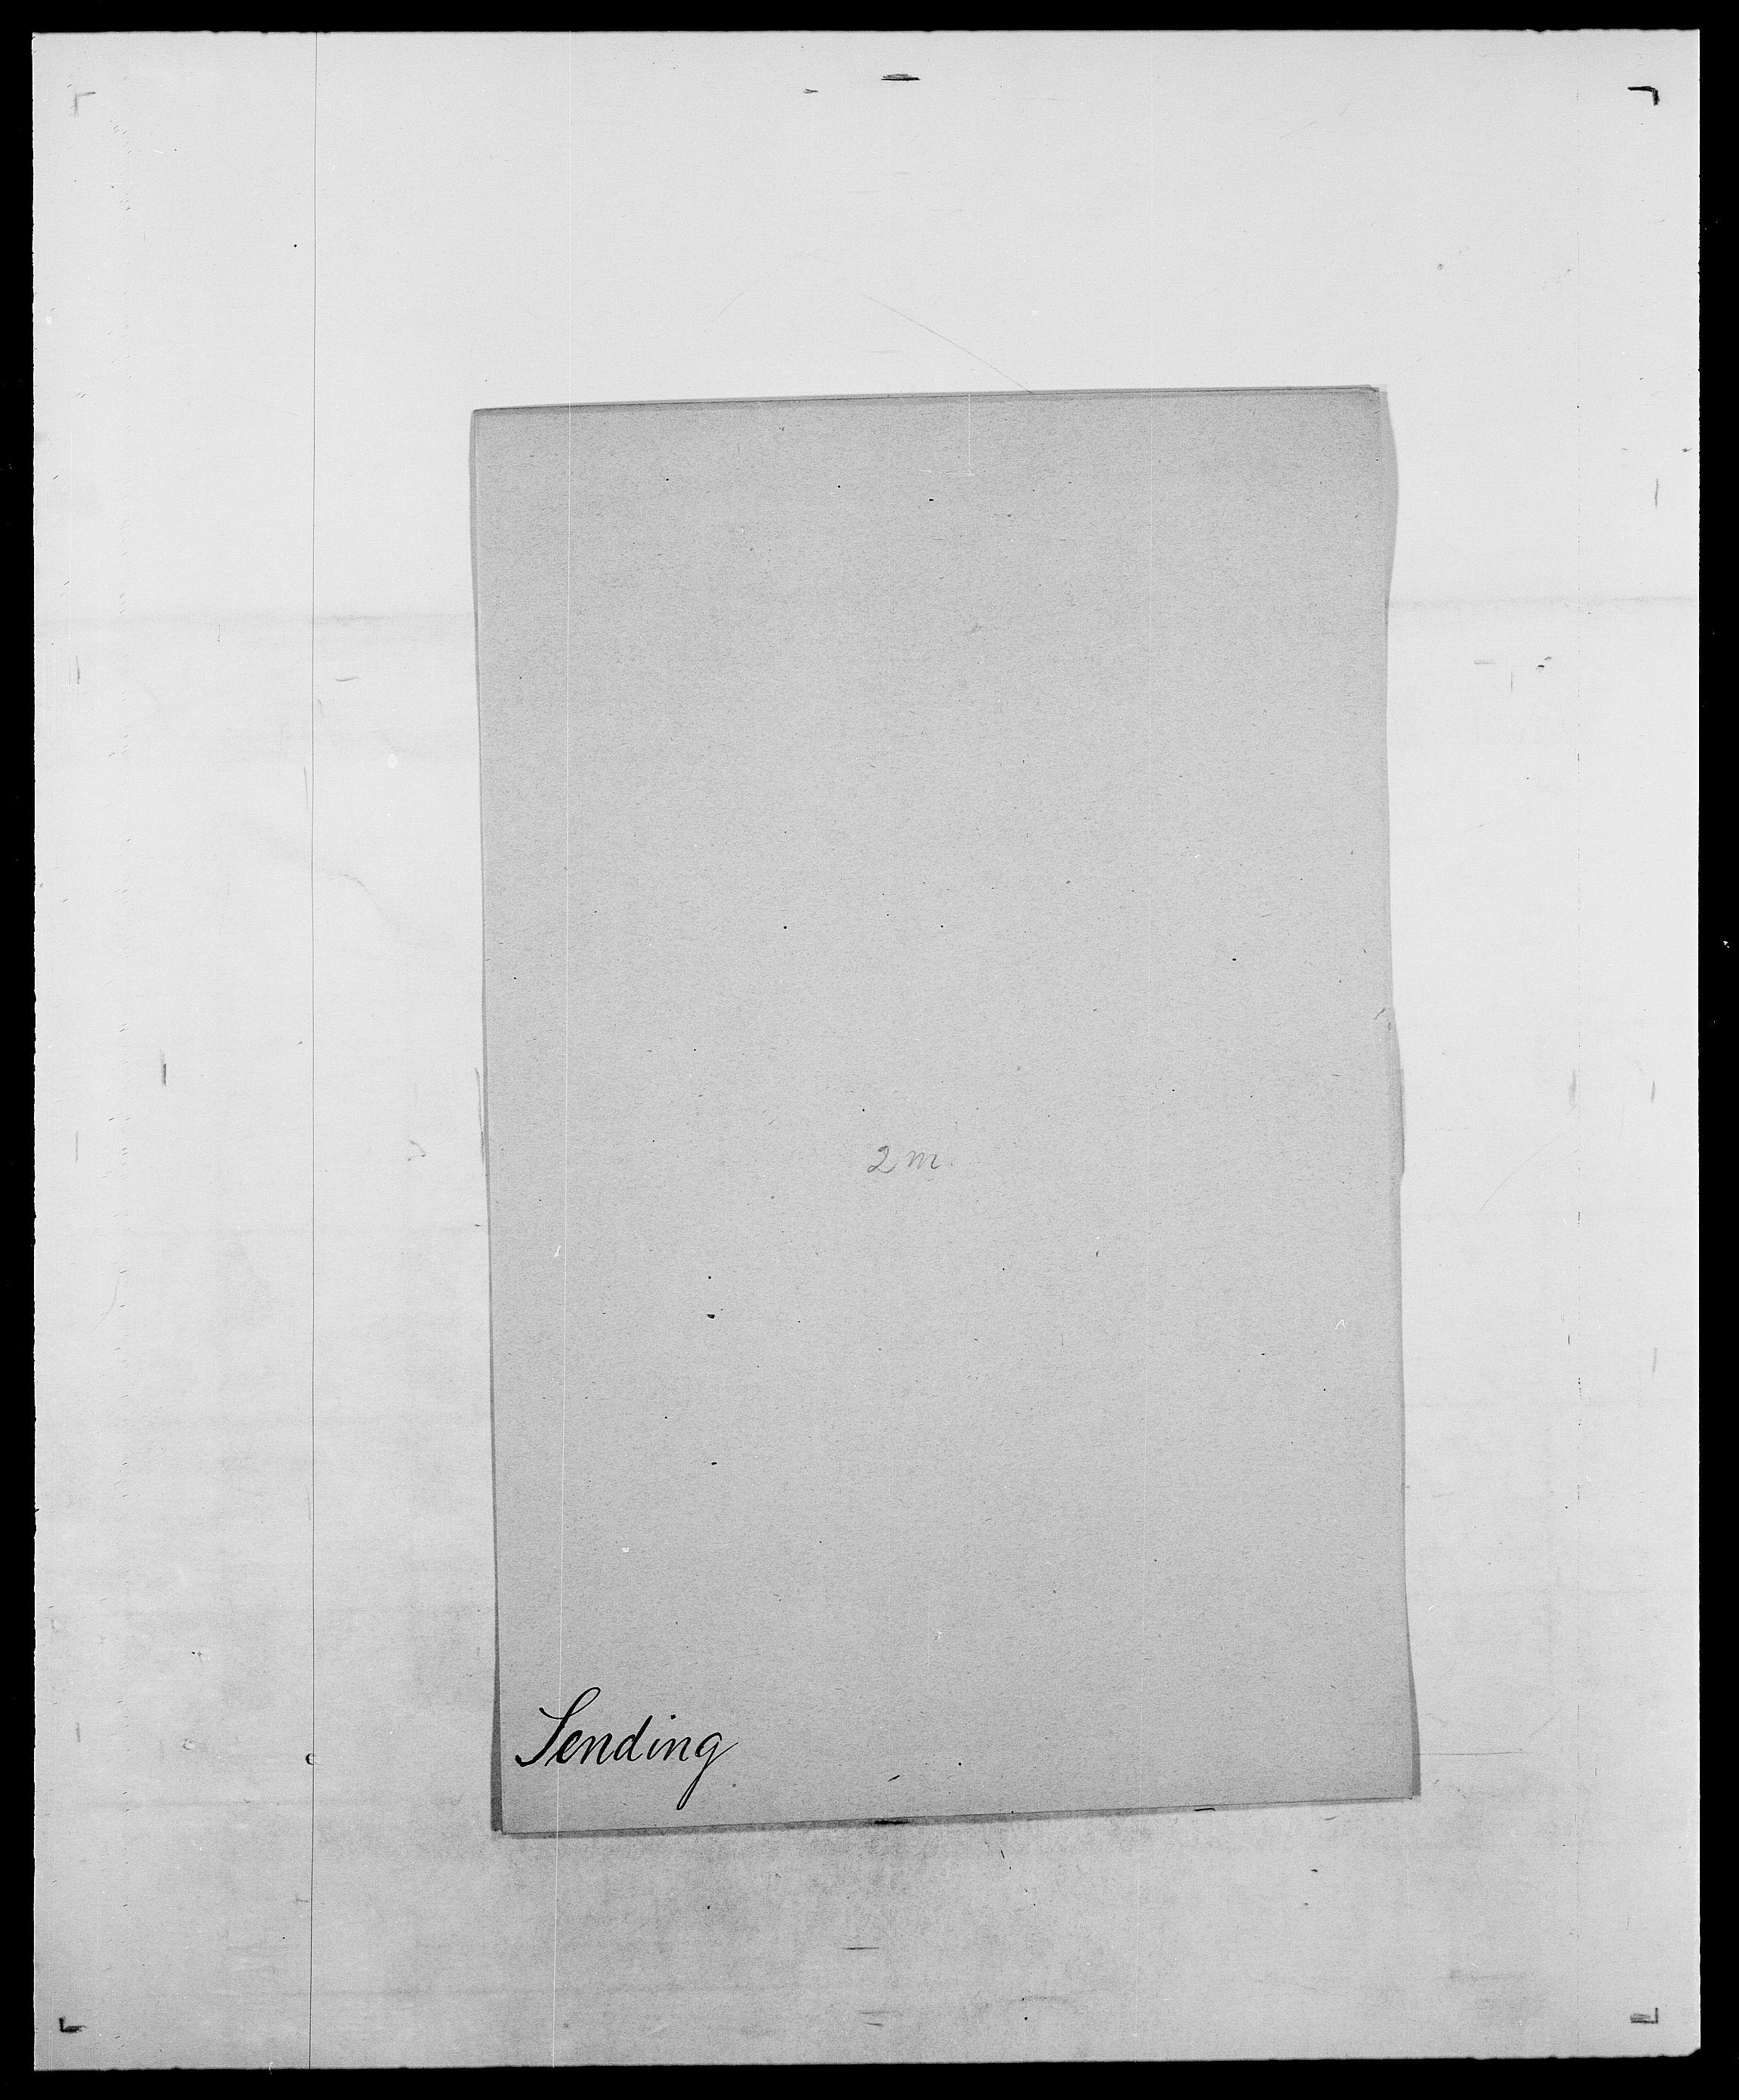 SAO, Delgobe, Charles Antoine - samling, D/Da/L0035: Schnabel - sjetman, s. 710